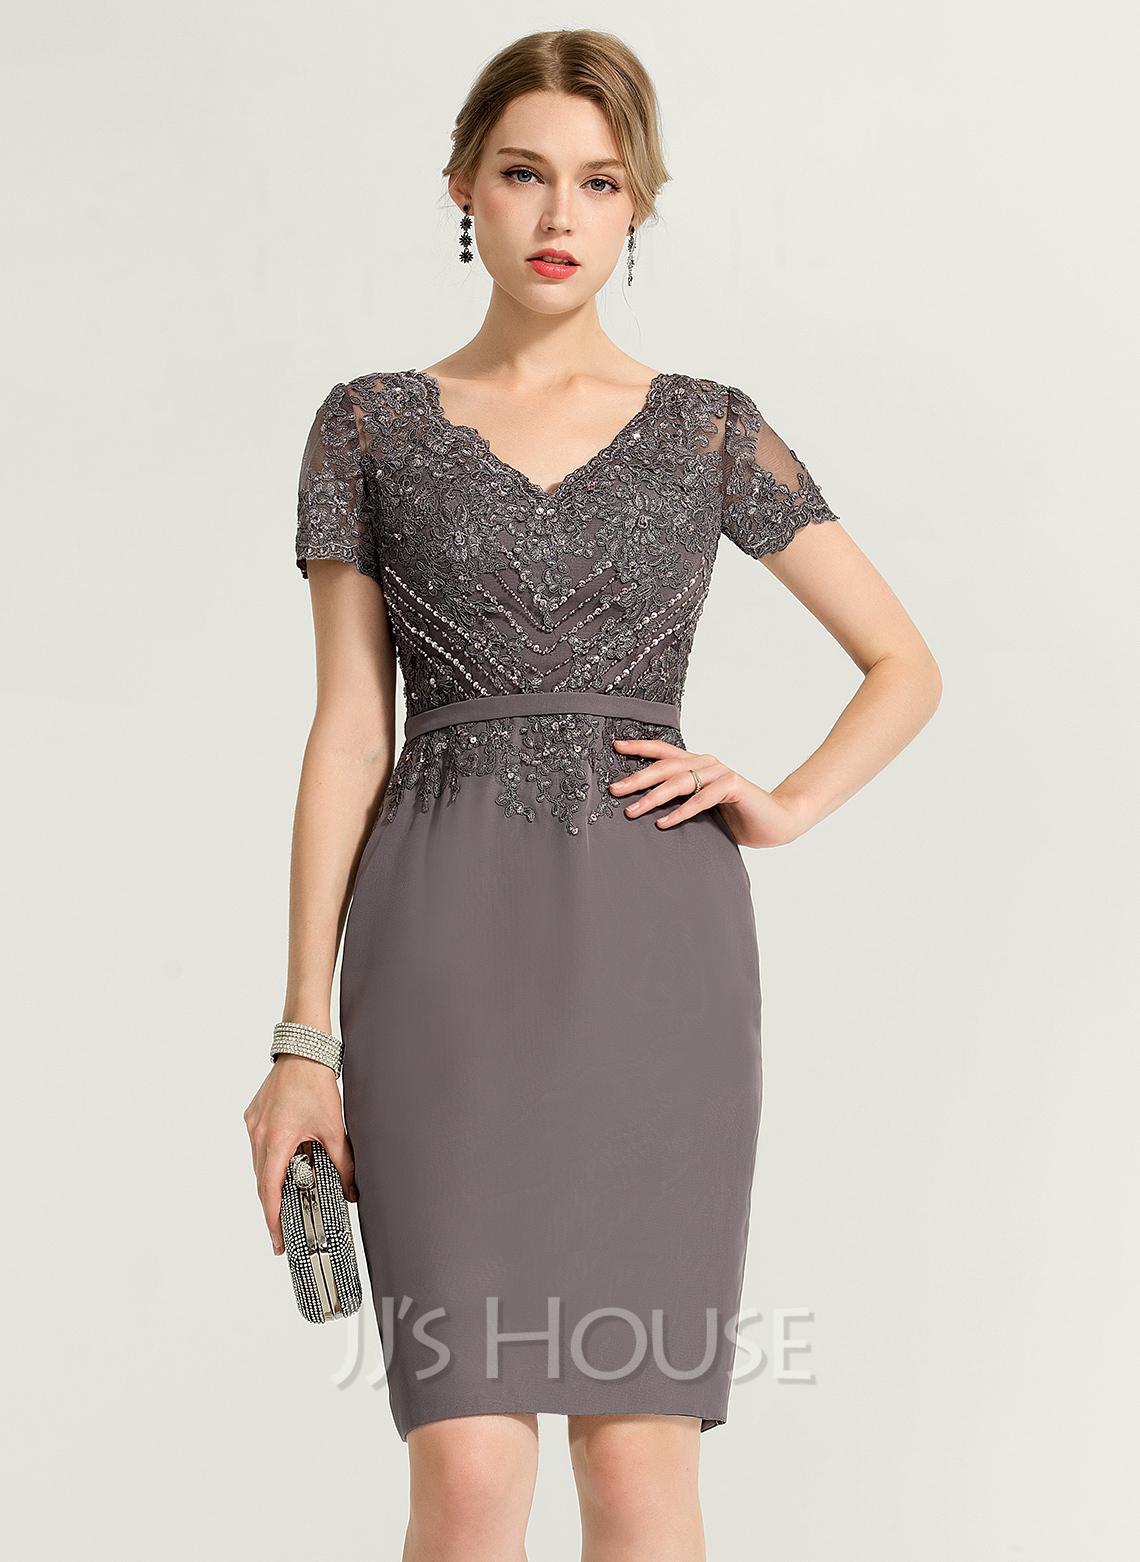 Sheath/Column V-neck Knee-Length Chiffon Cocktail Dress With Beading Sequins